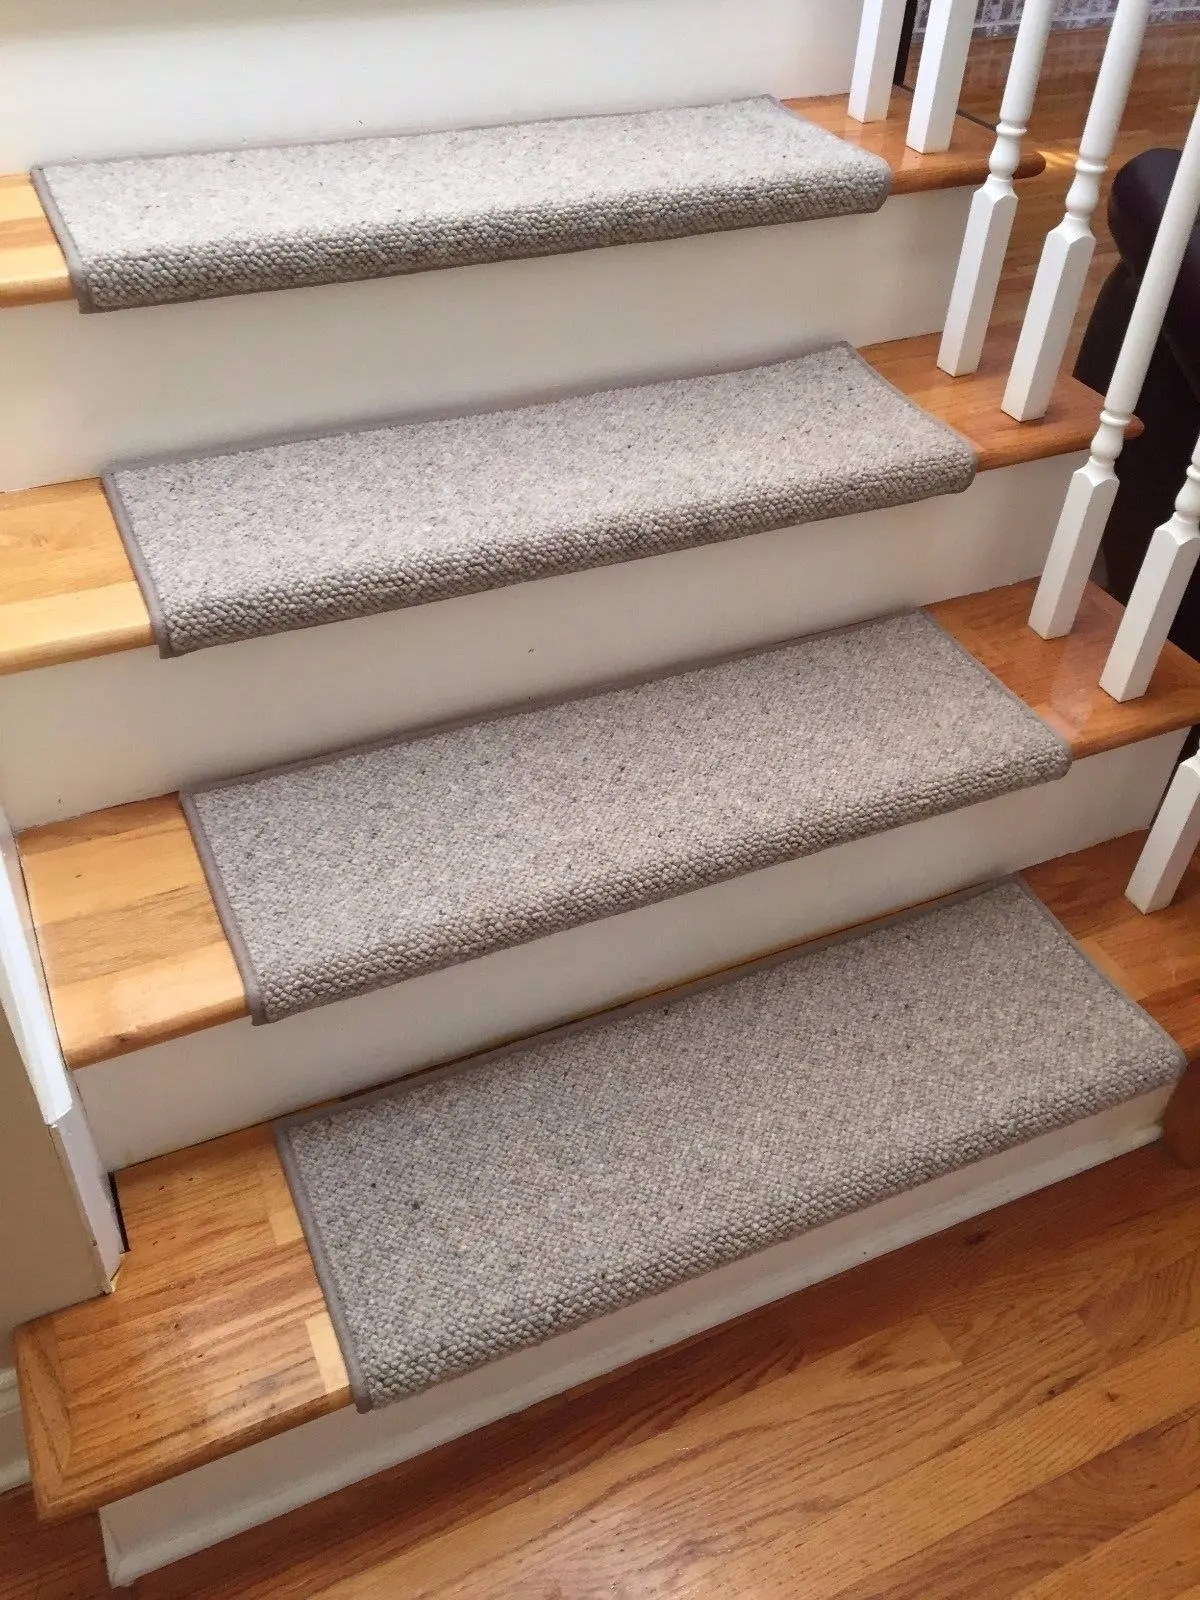 Alfa Stone 100 Wool True Bullnose™ Padded Carpet Stair Tread   Carpet Treads For Steps   Oak   Double Thickness Tread   Textured   Anti Slip   Creative